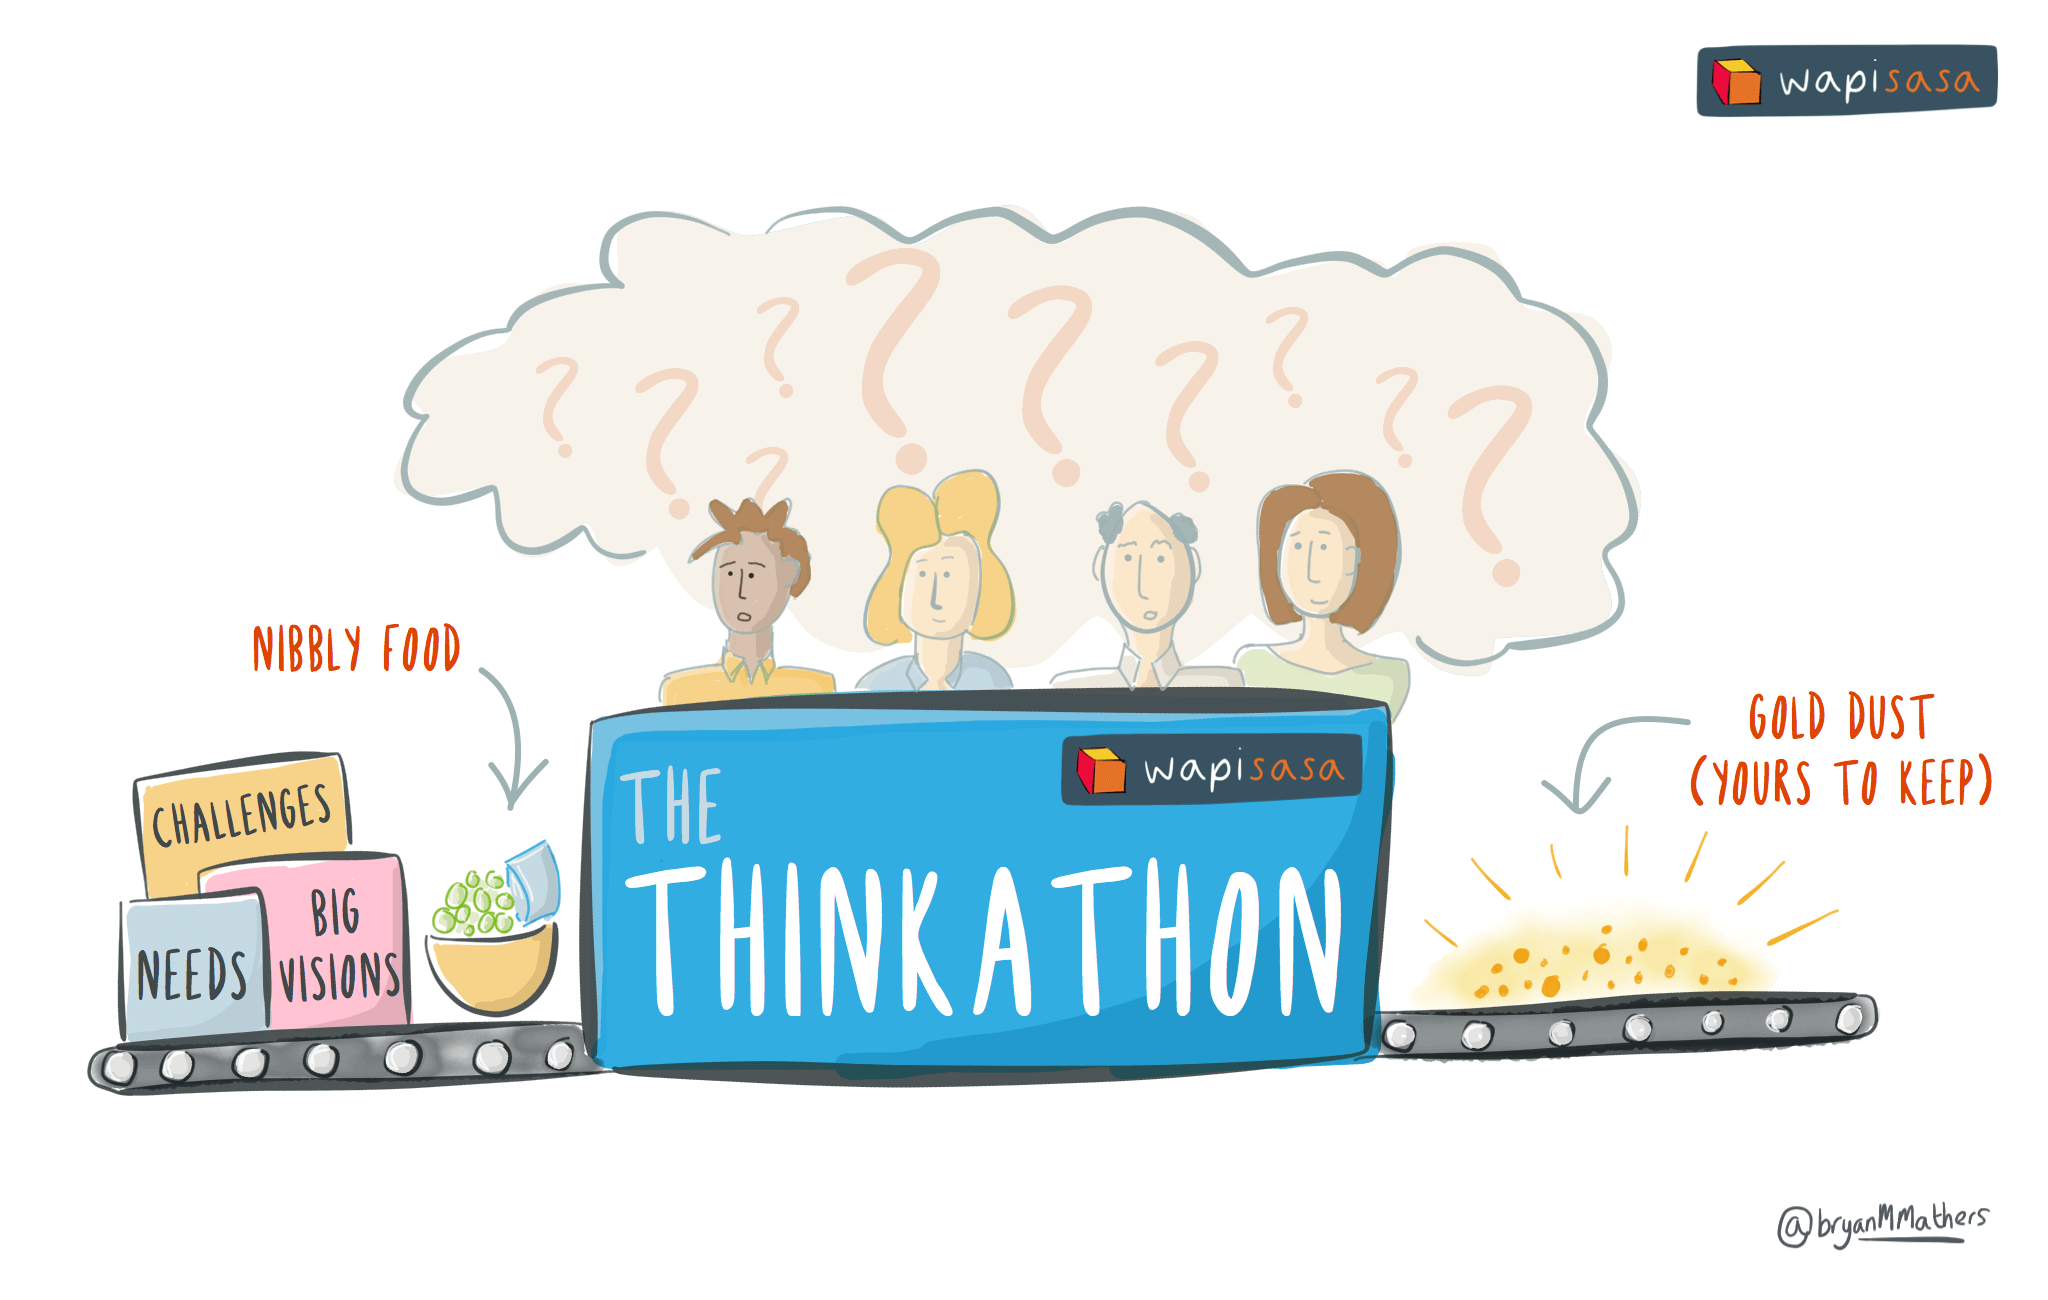 The Thinkathon